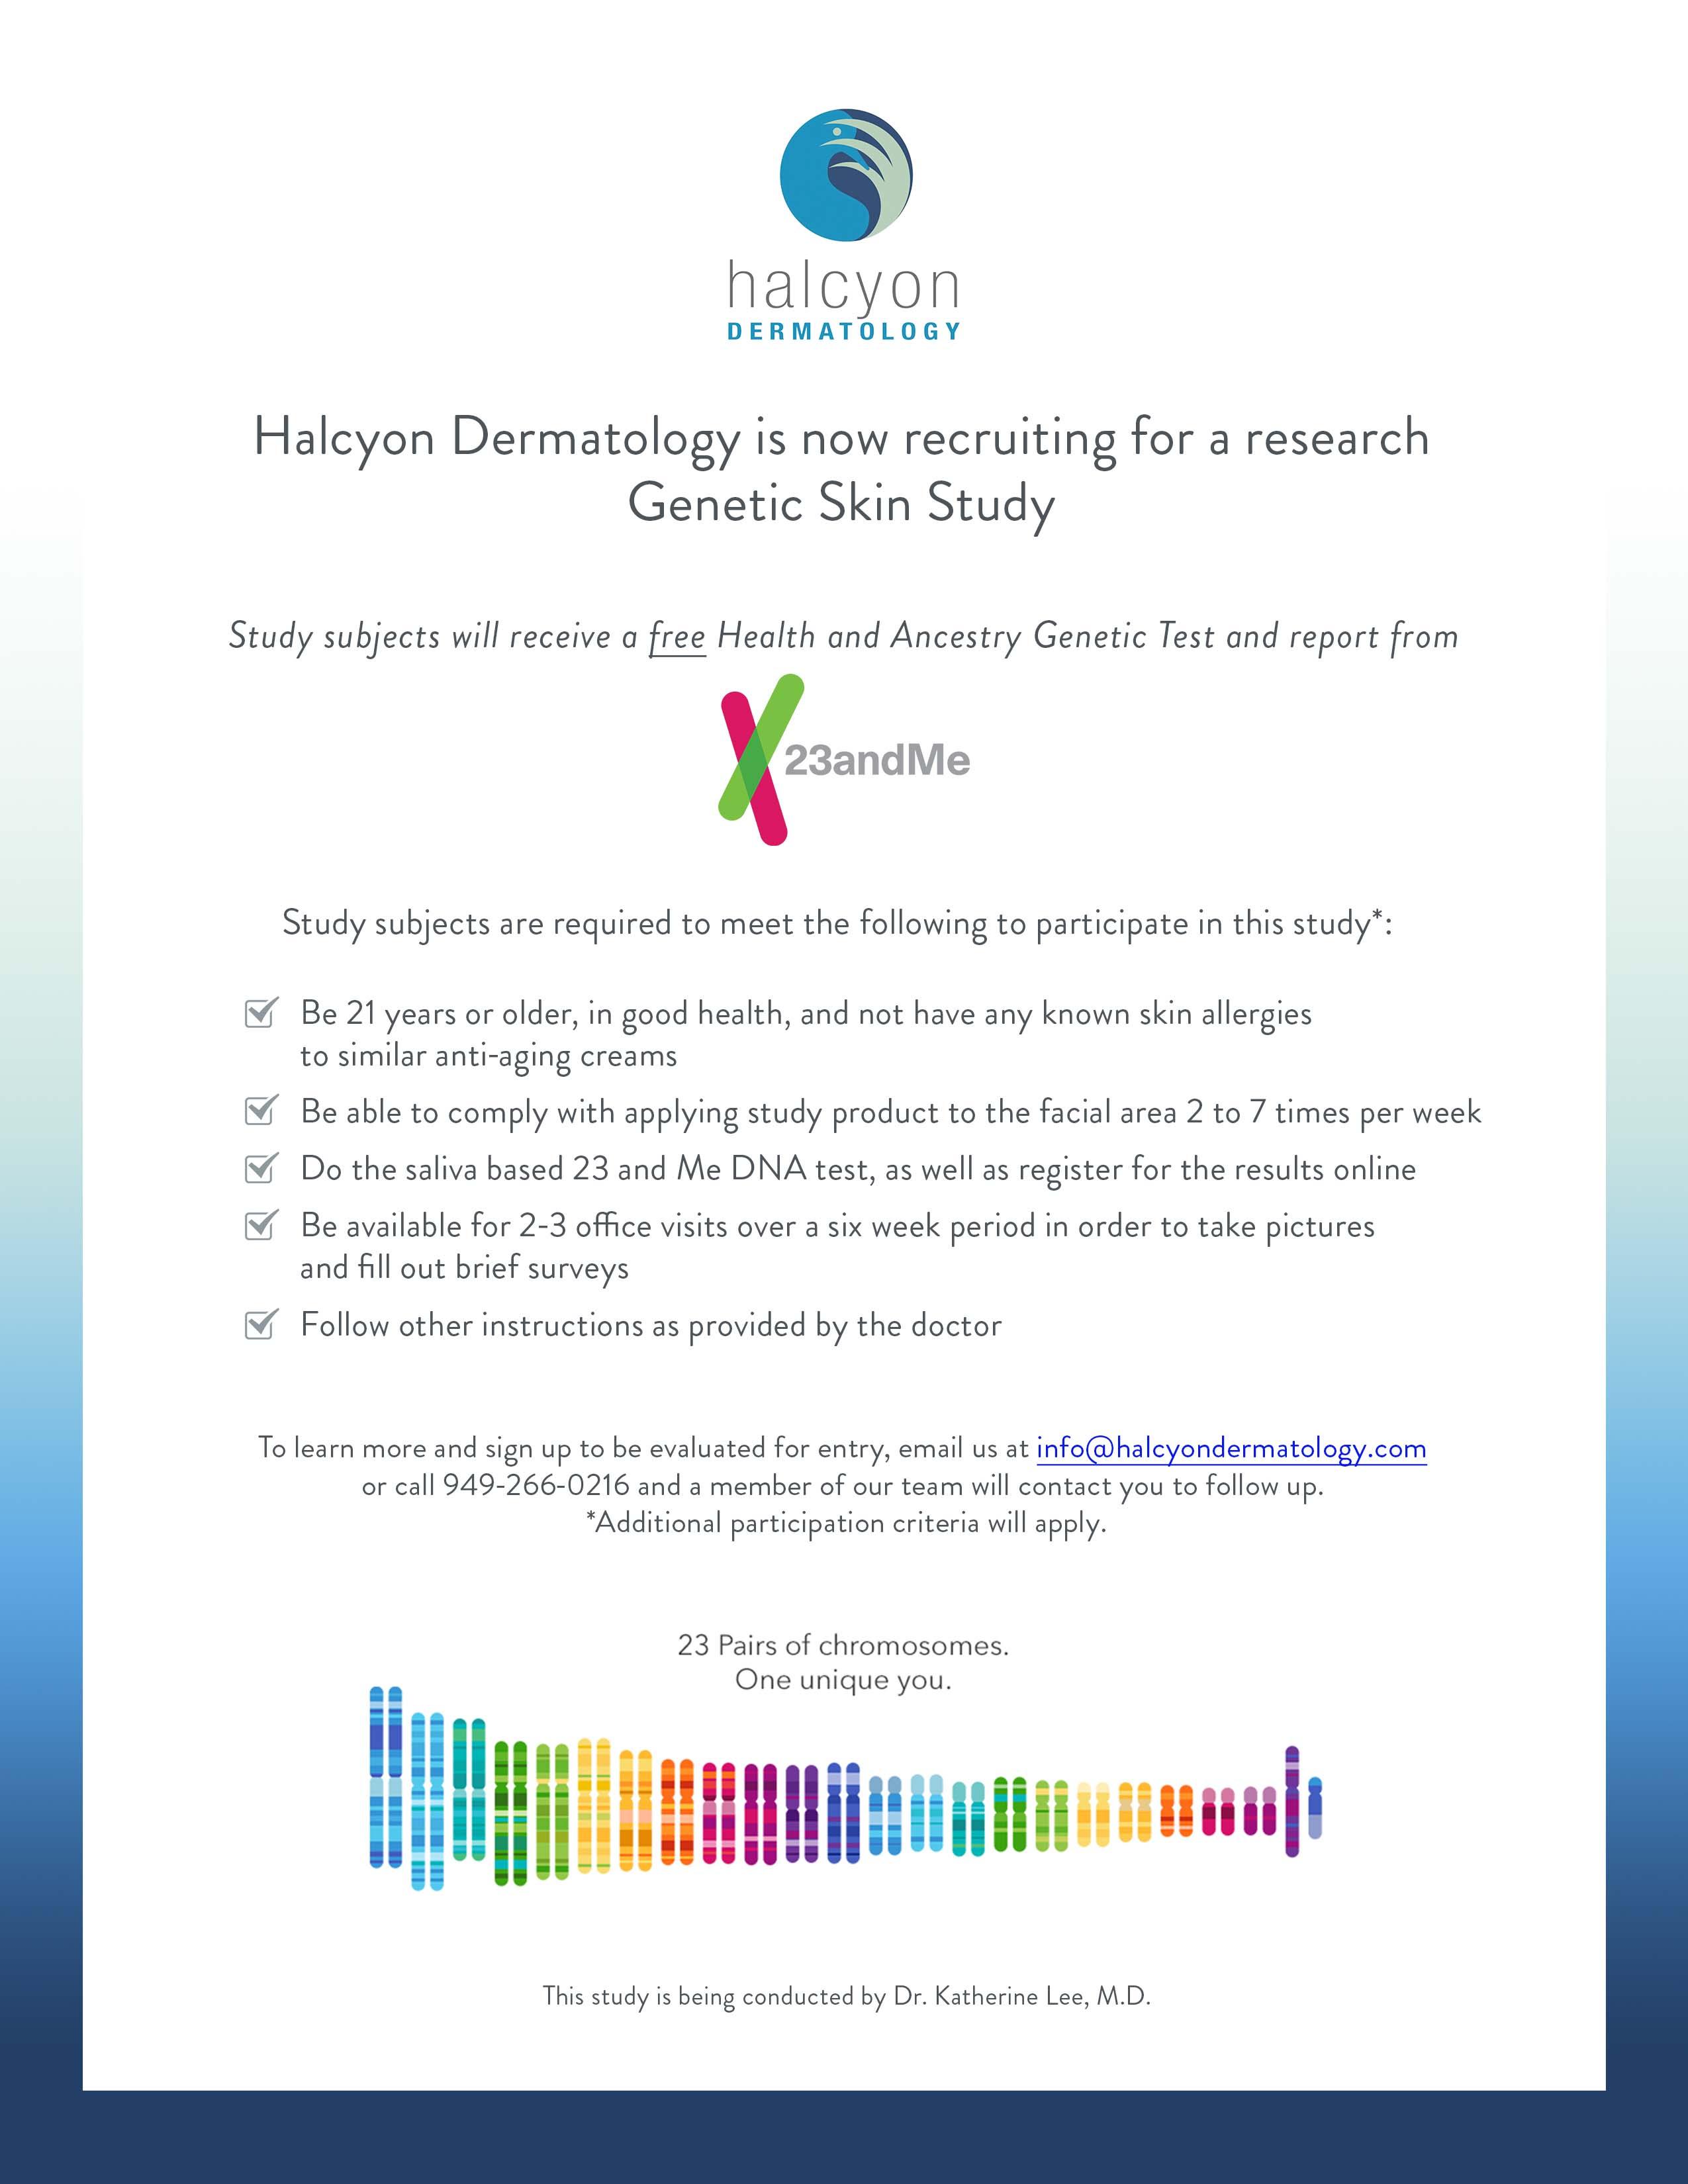 Halcyon Dermatology Genetic Skin Study